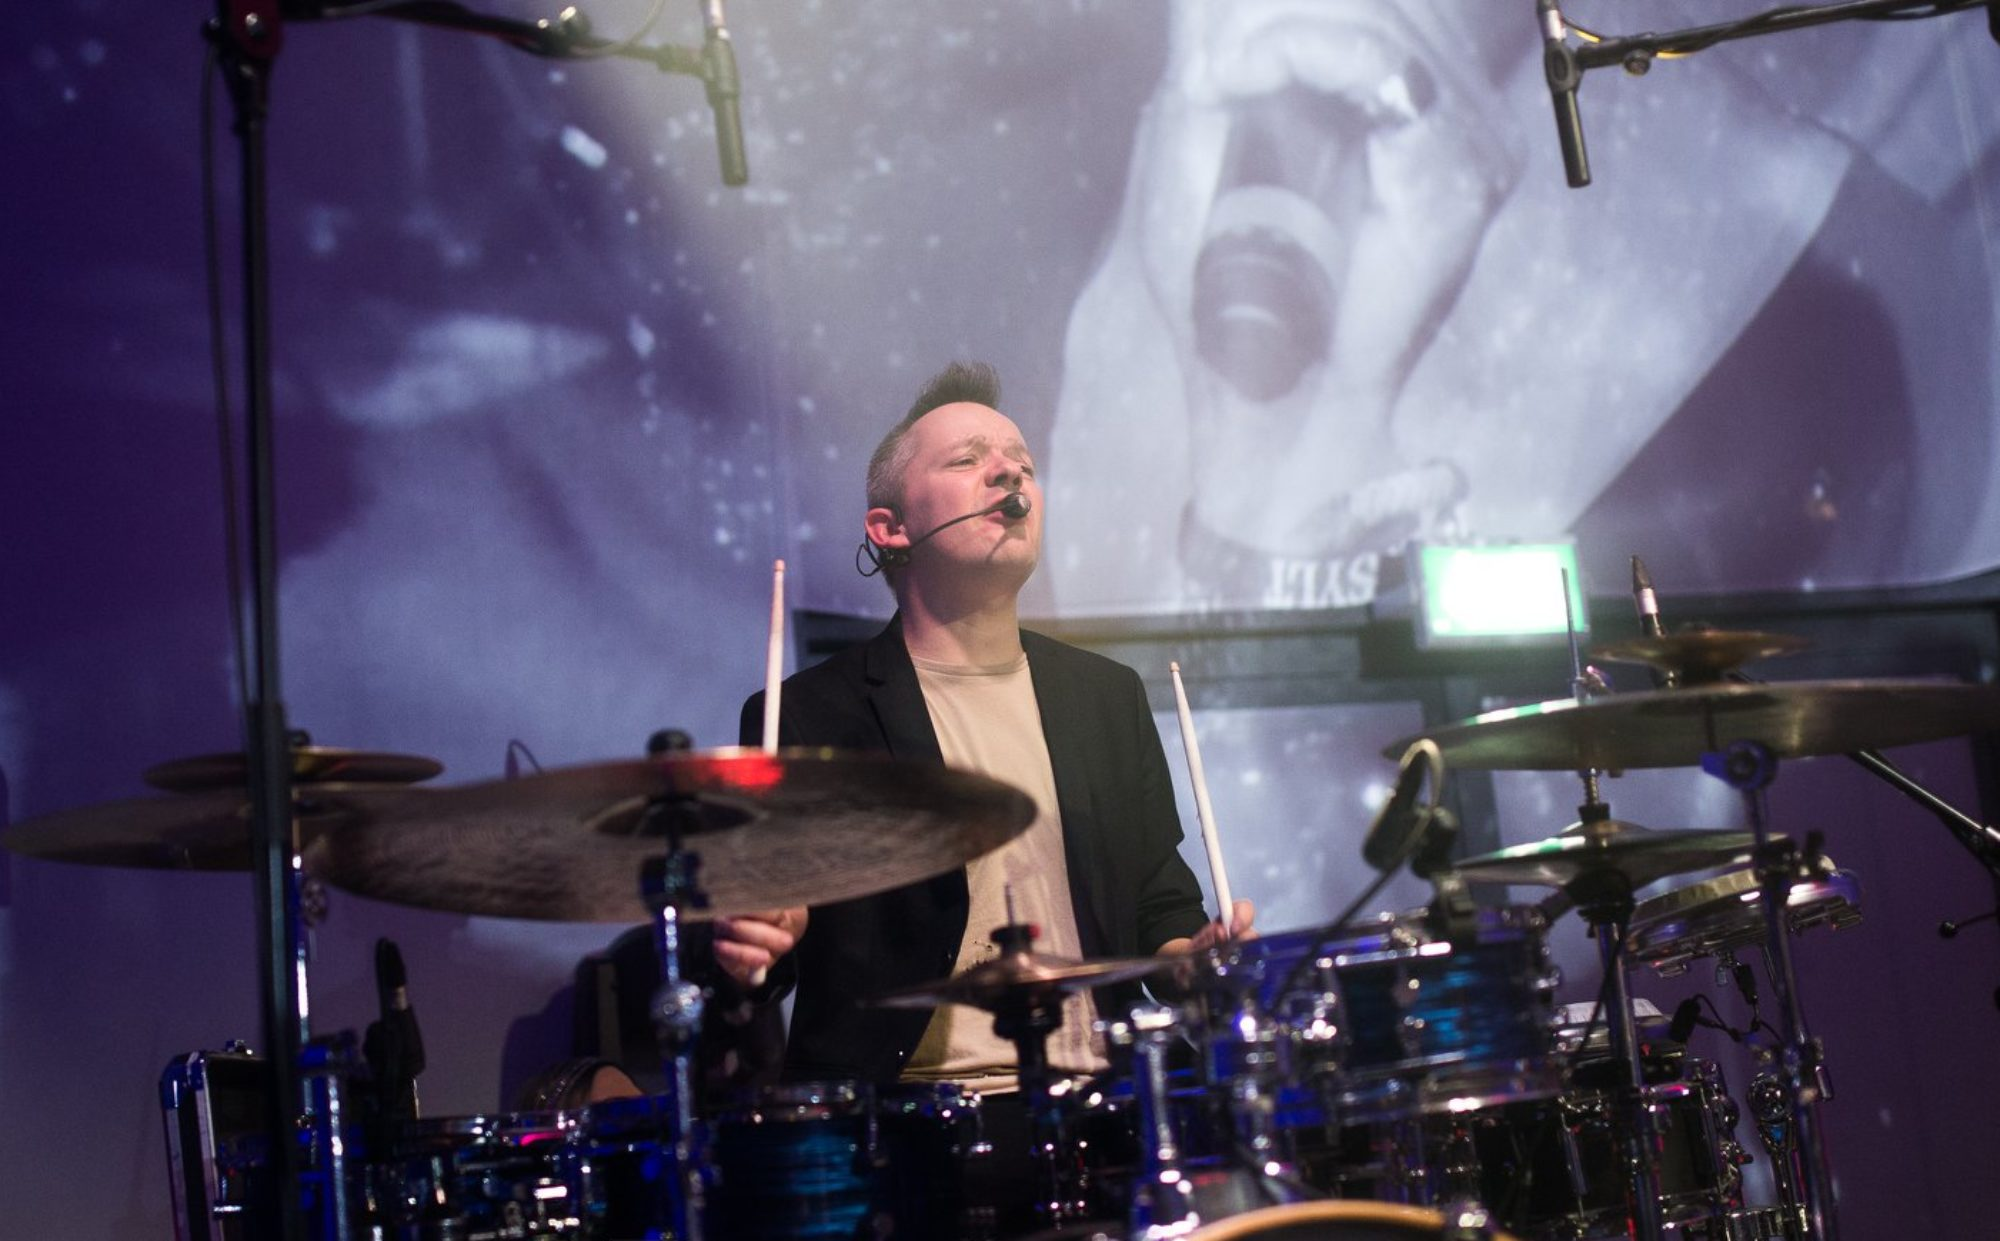 Martin Greule